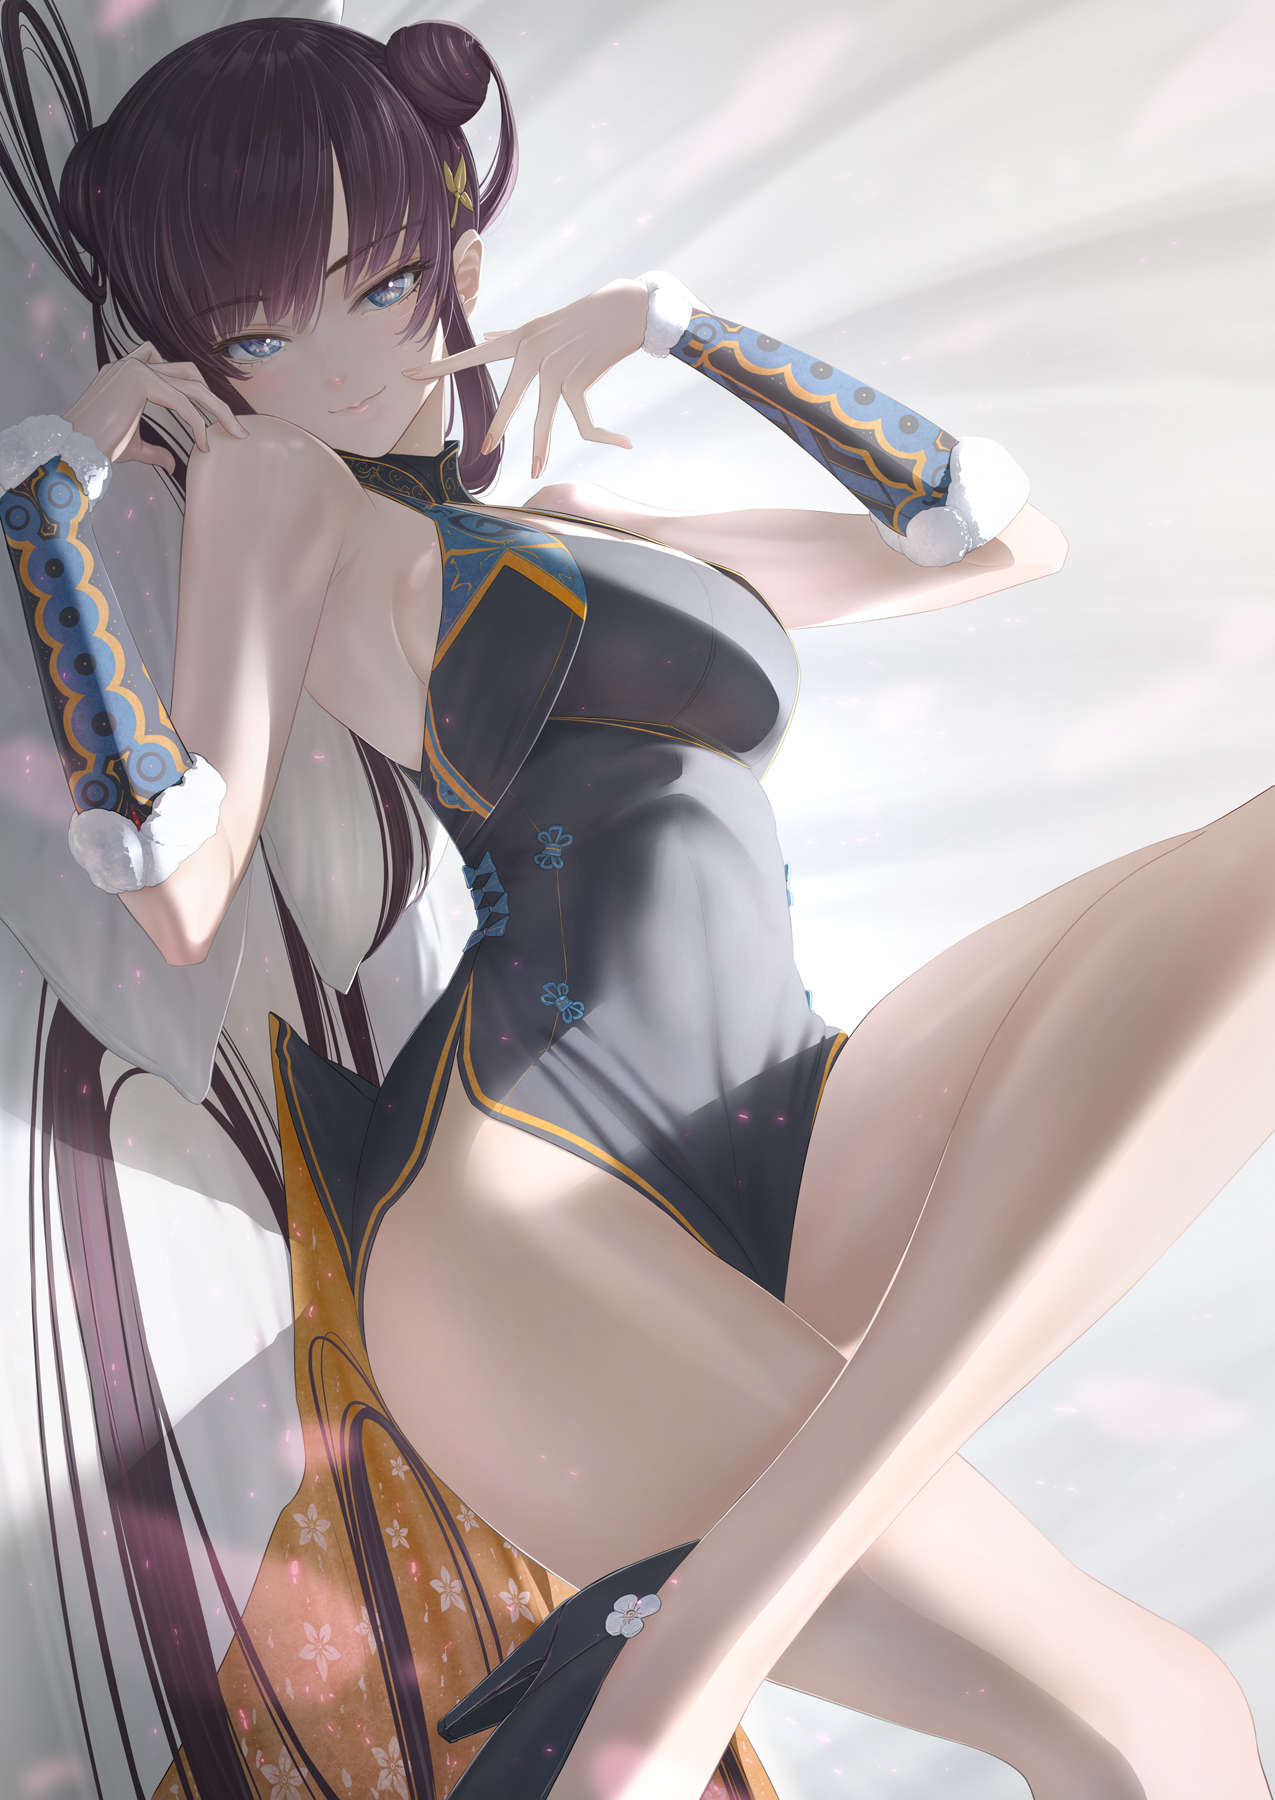 Anime 1275x1800 anime anime girls digital art artwork 2D portrait display vertical simple background long hair blue eyes black hair legs smiling